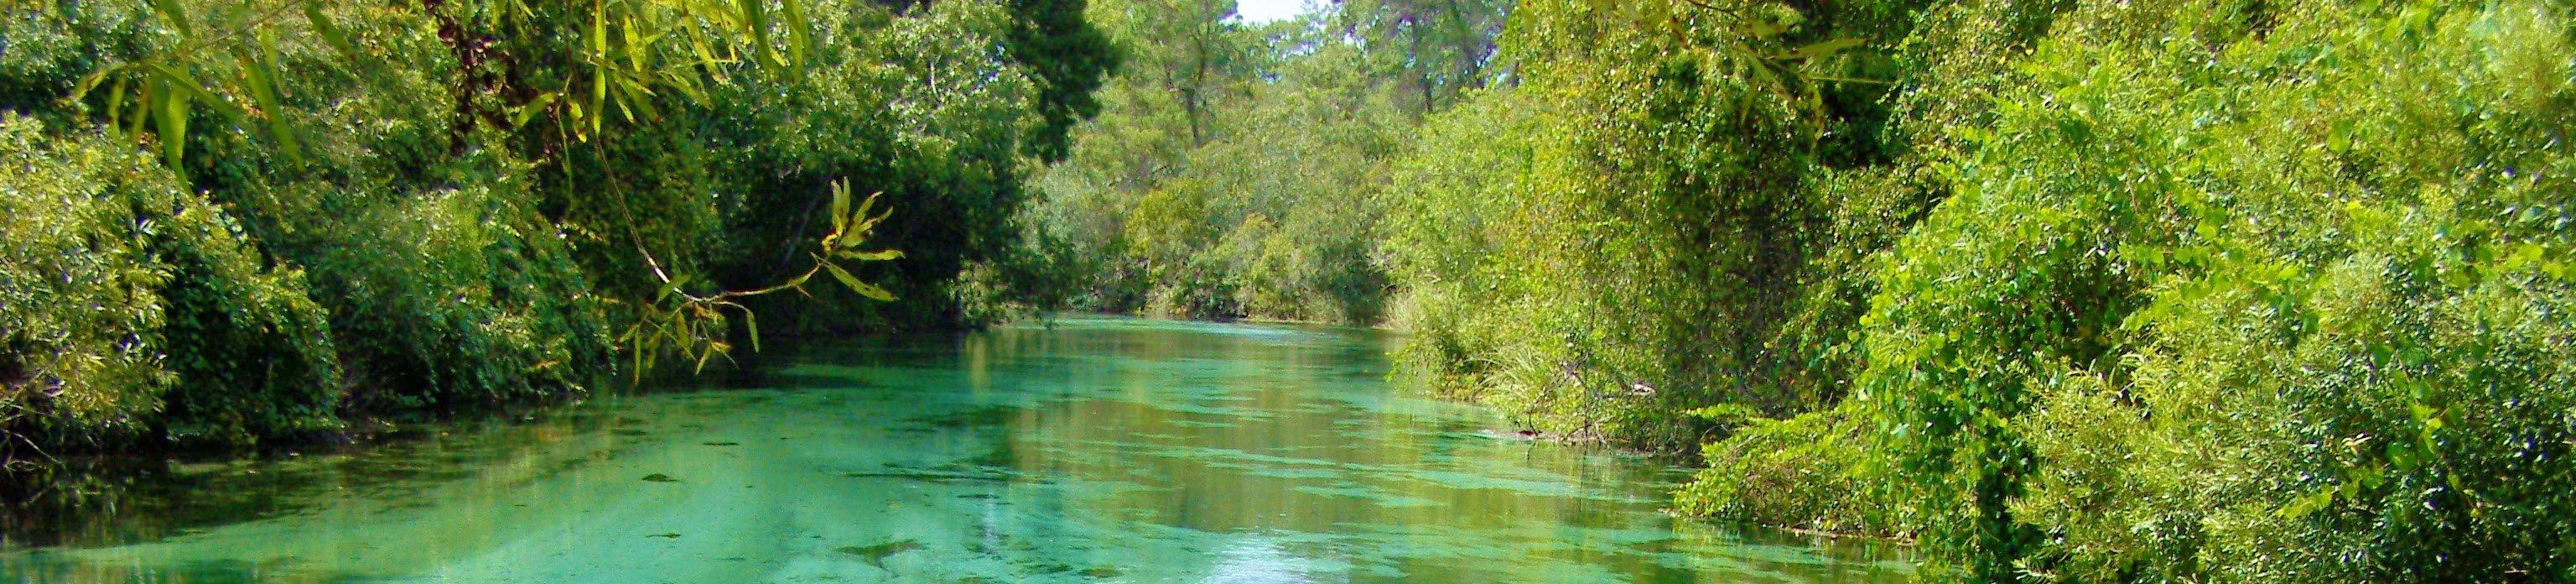 Florida Family Beach Vacations The Nature Coast